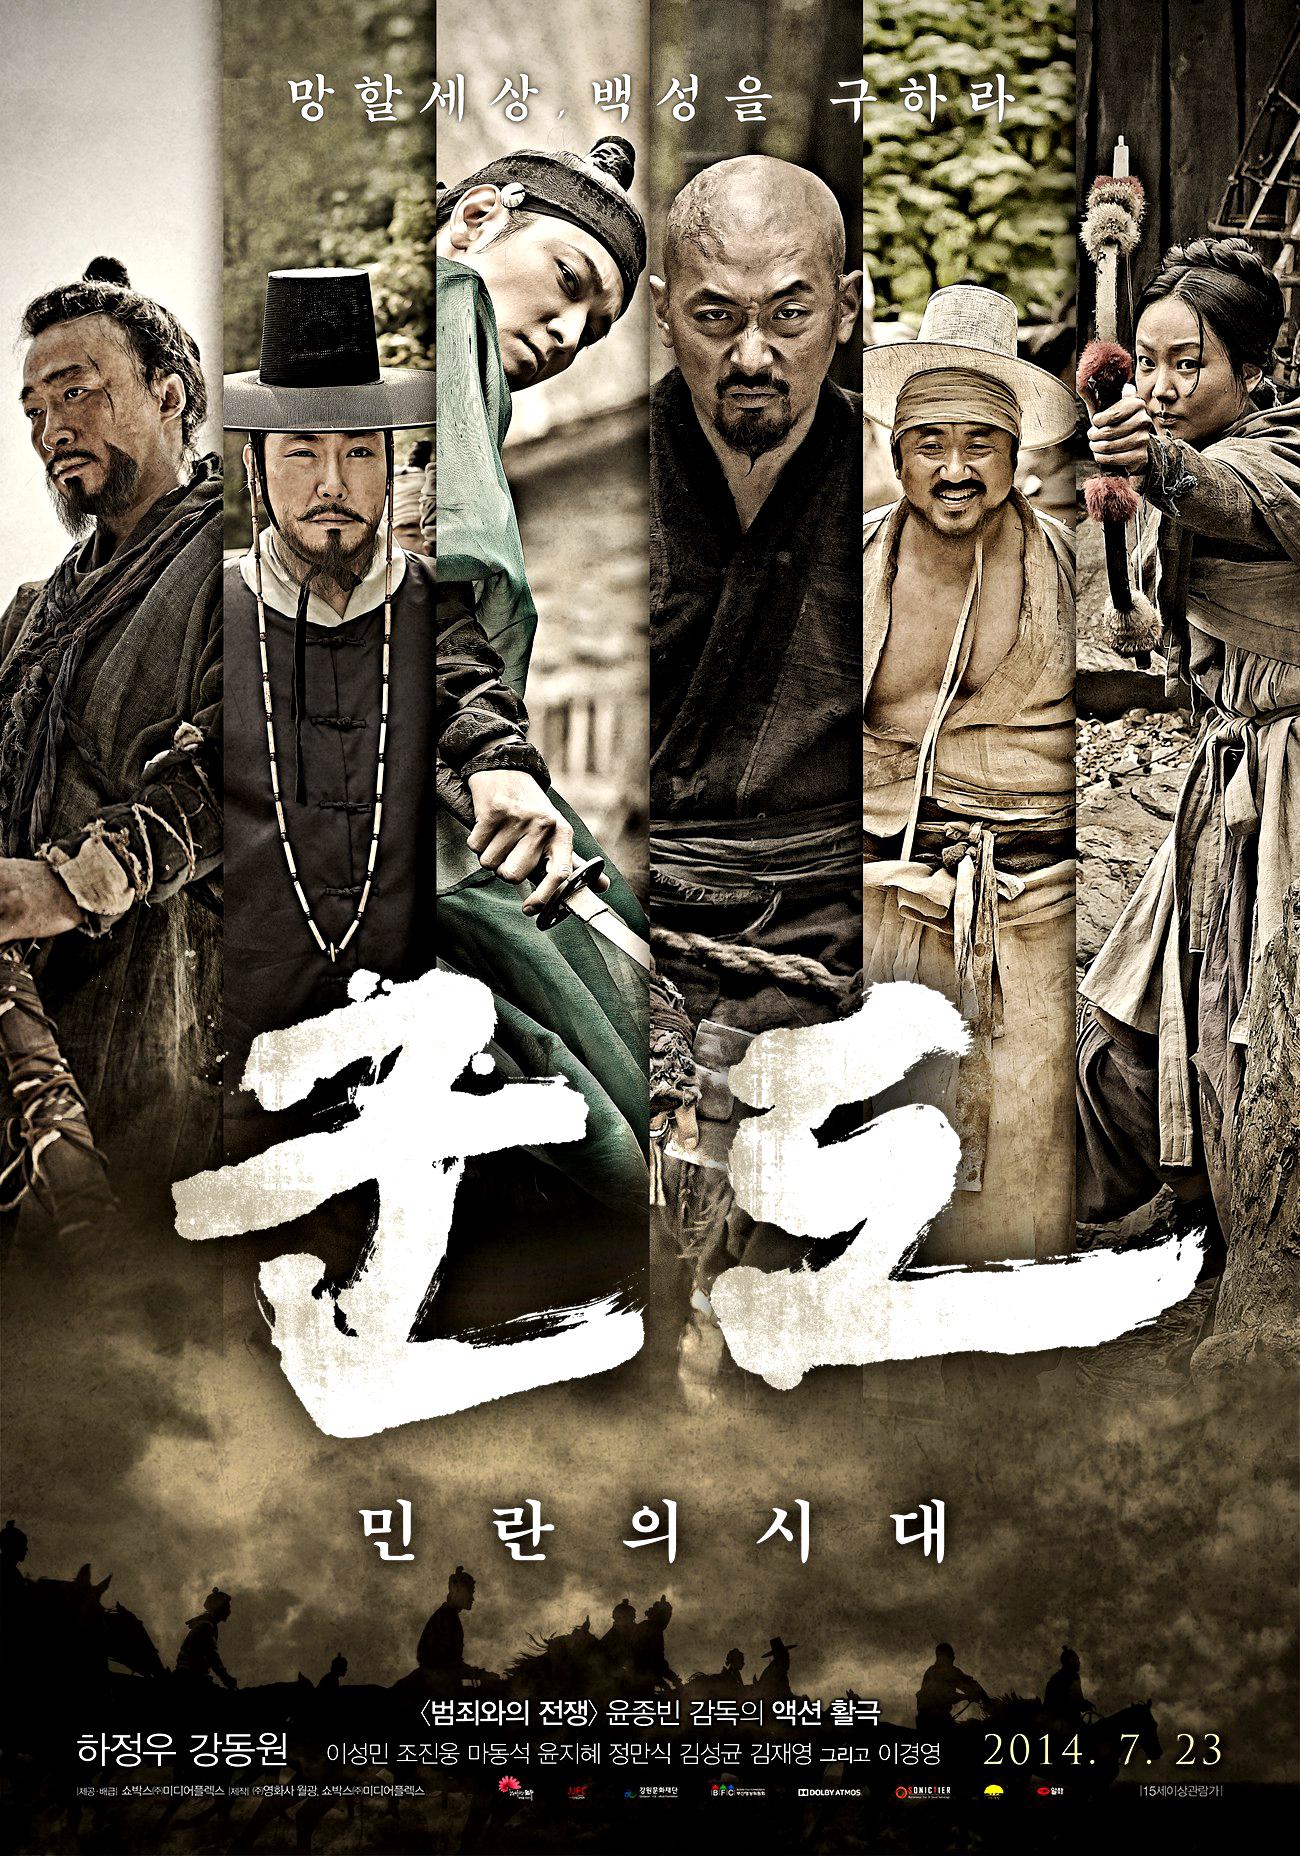 Kundo: Min-ran-eui si-dae